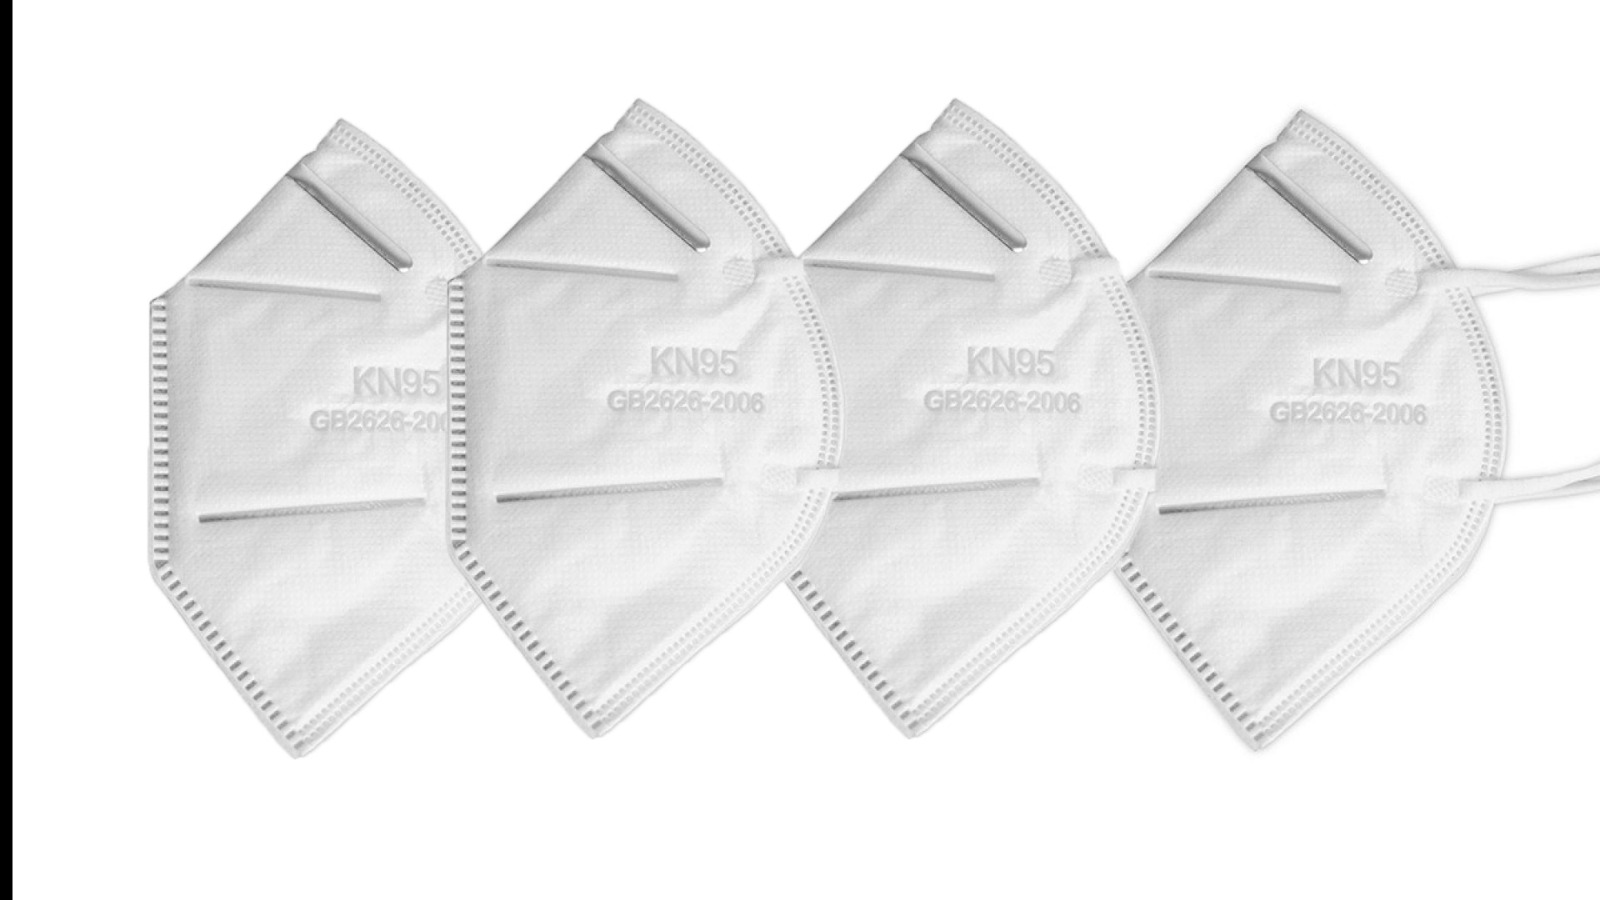 4er Set KN95 Atemschutzmaske